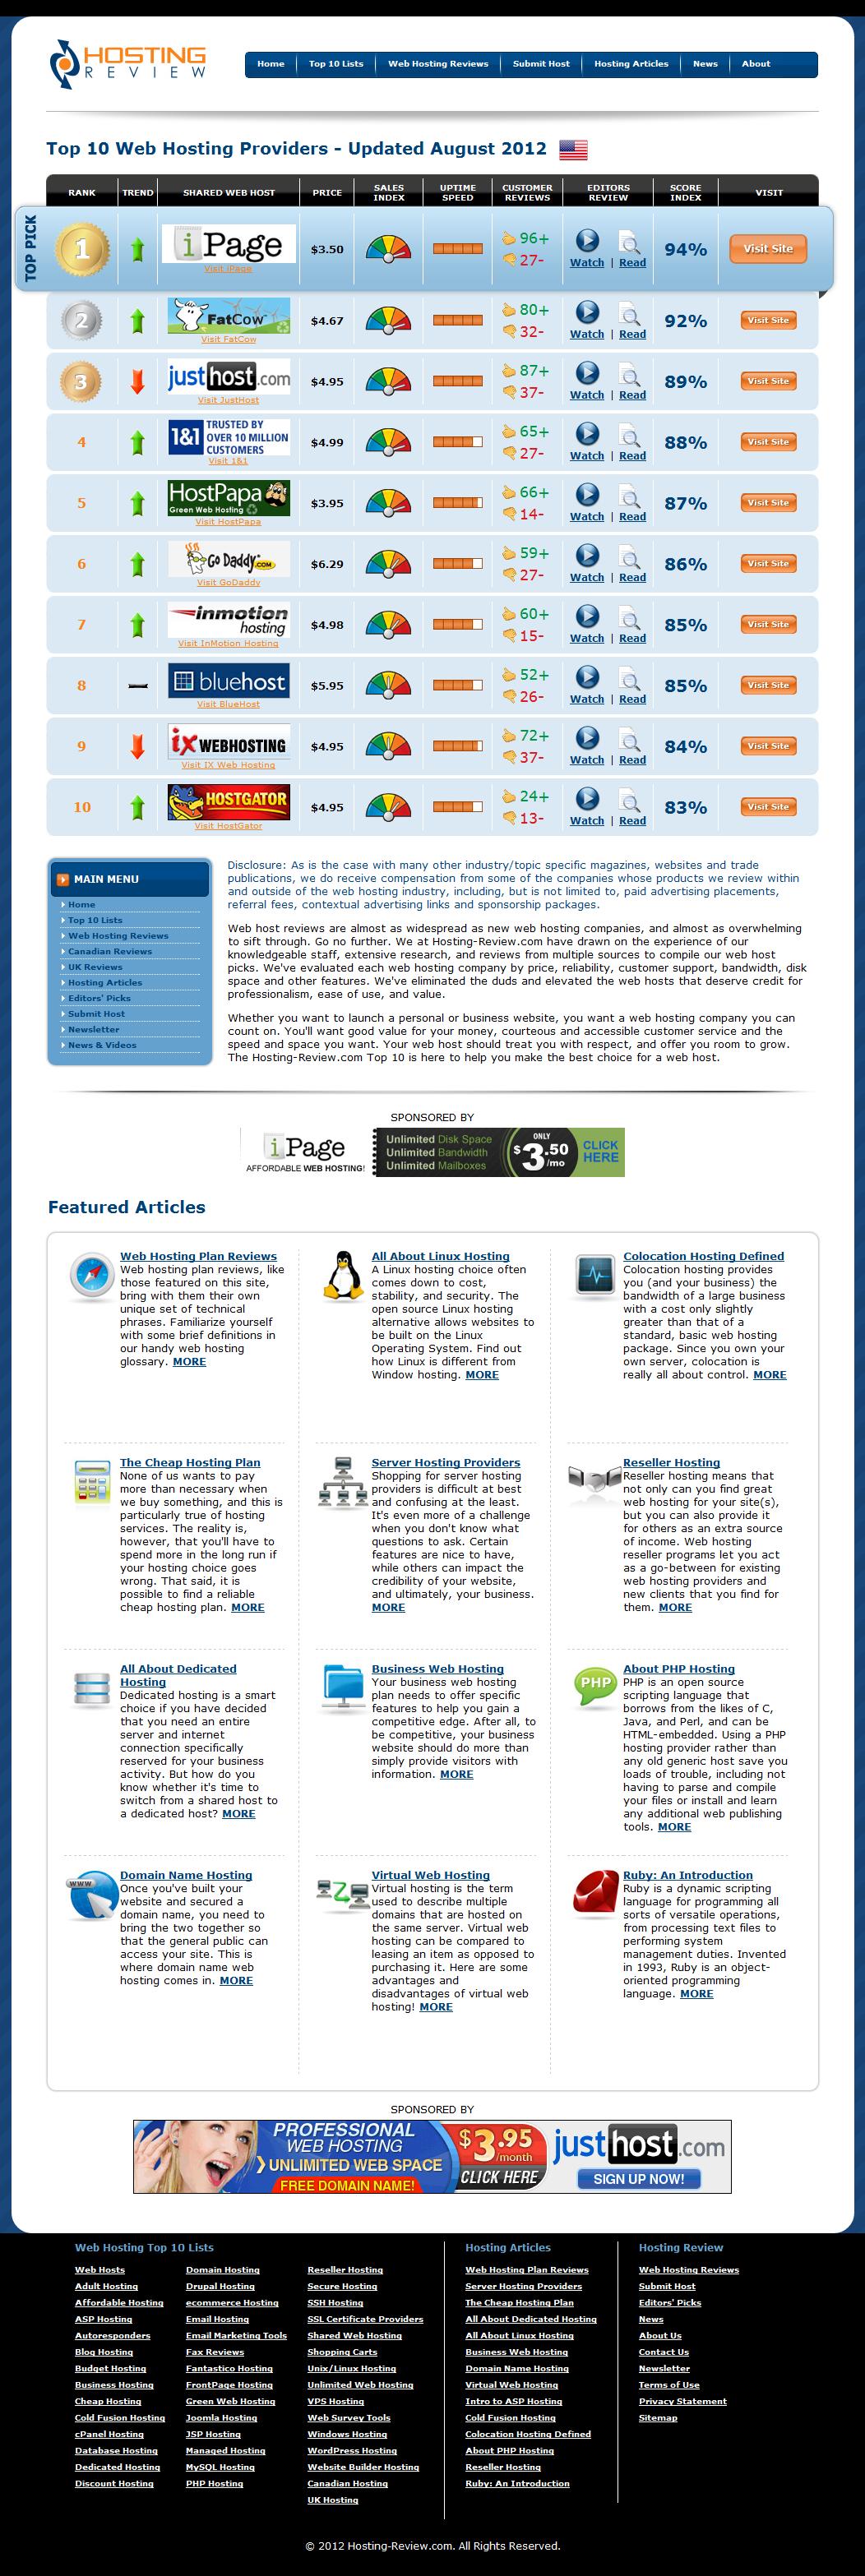 Hosting-Review-Web-hosting-comparison-site-rates-reviews-best-web-hosting-companies-194442.png